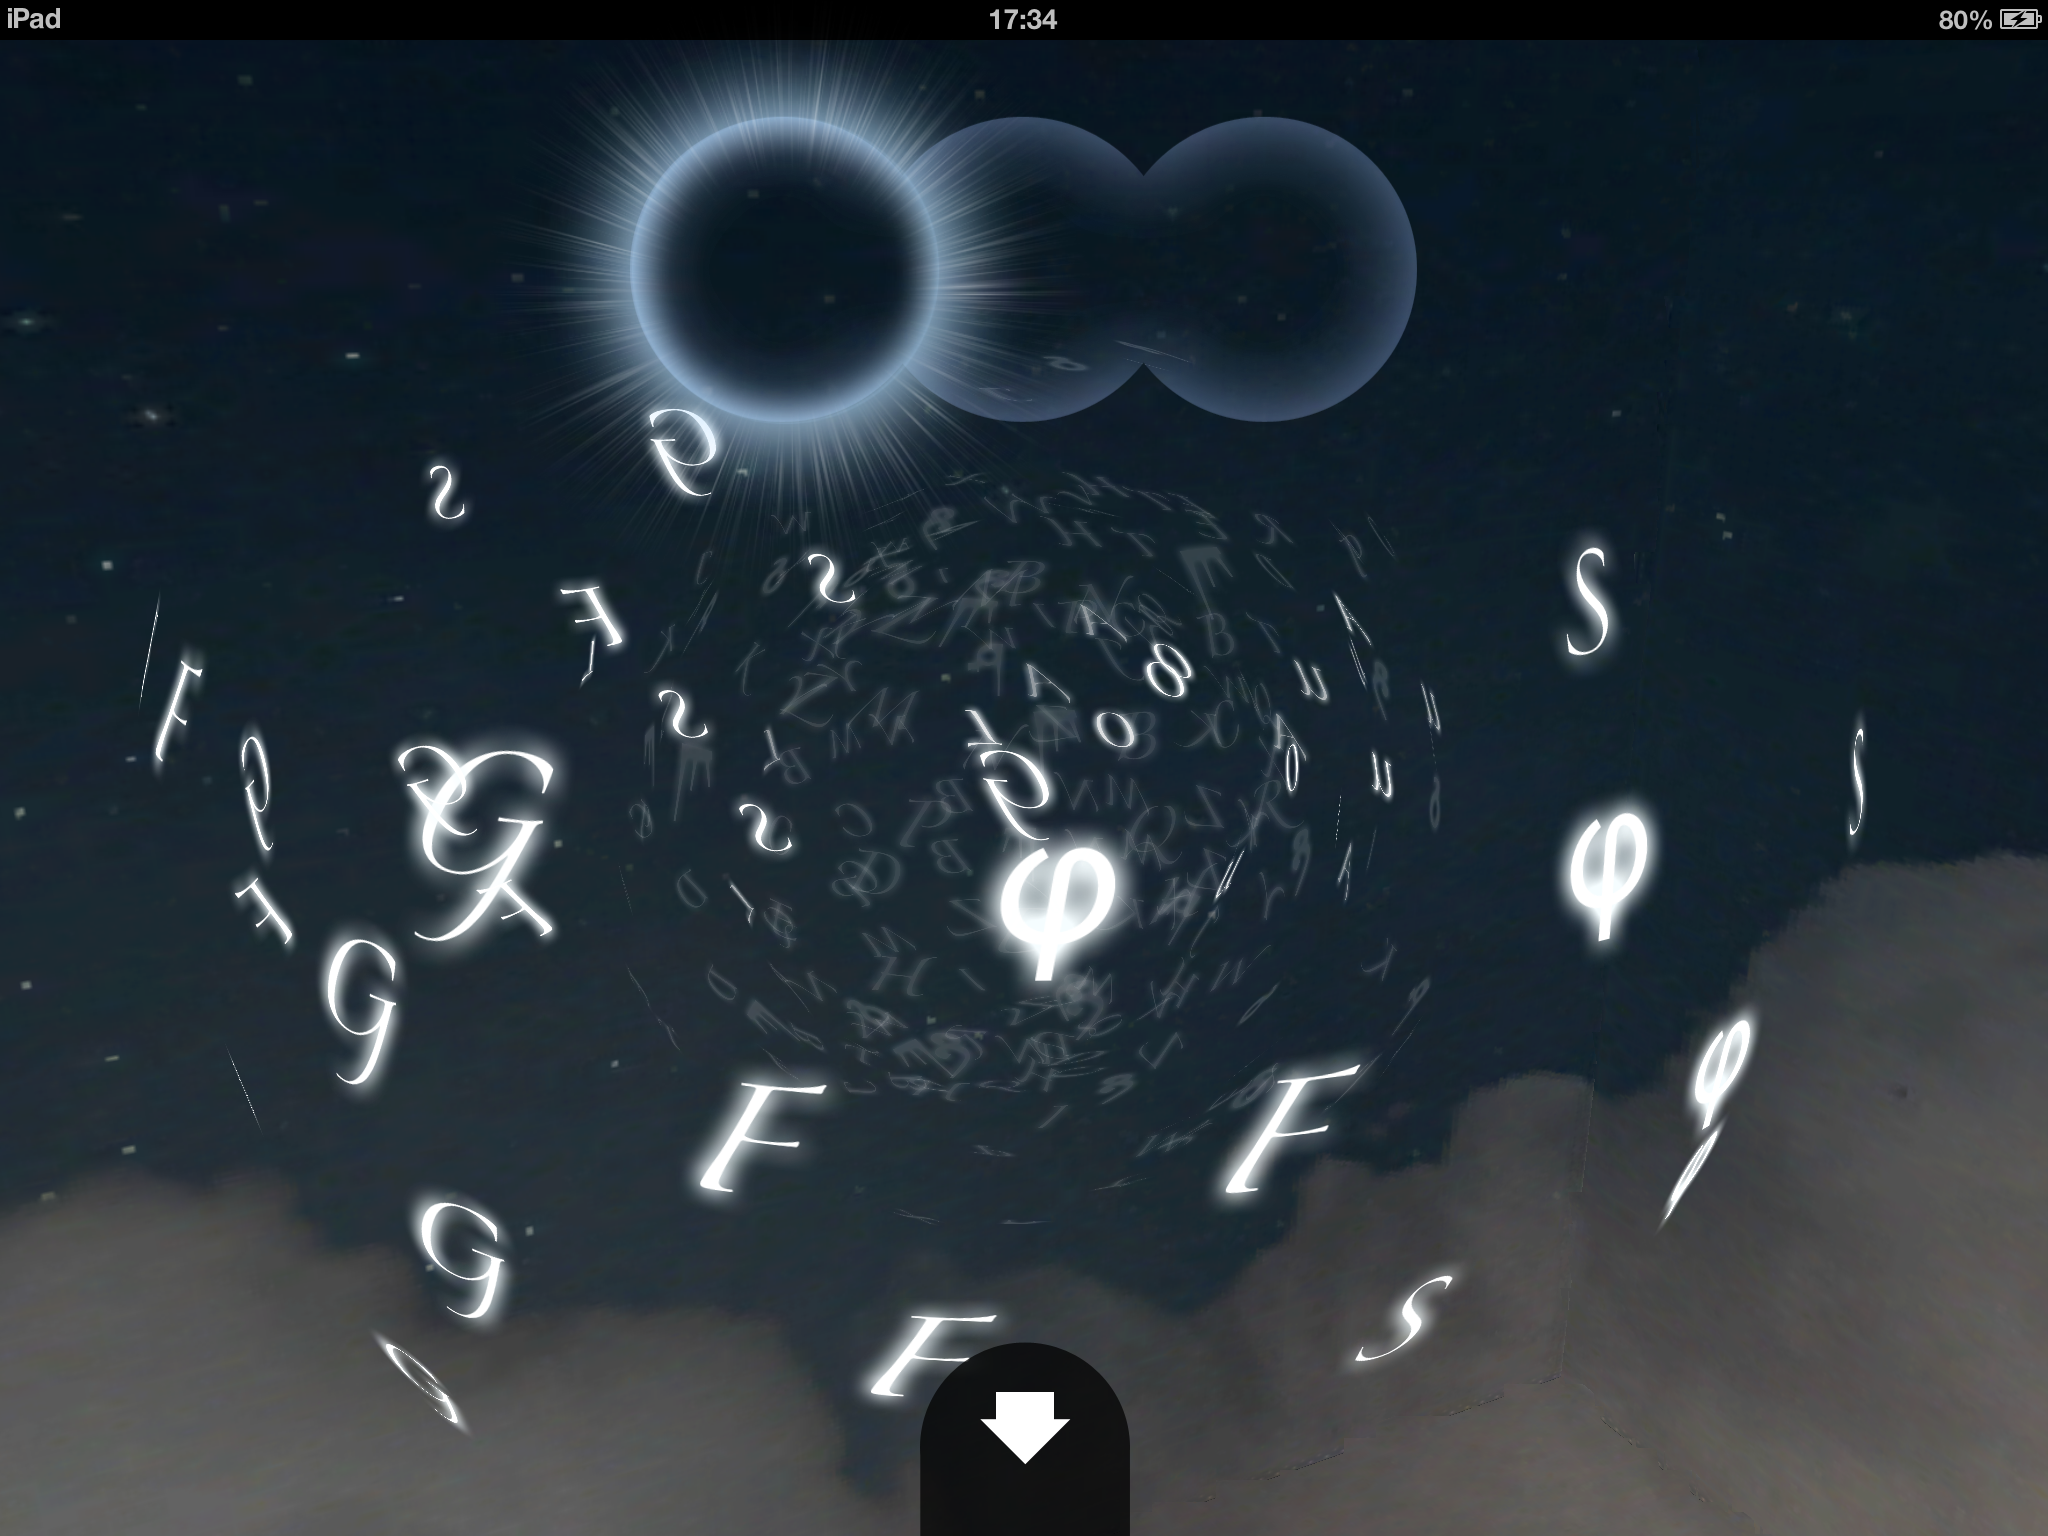 Sorcery6